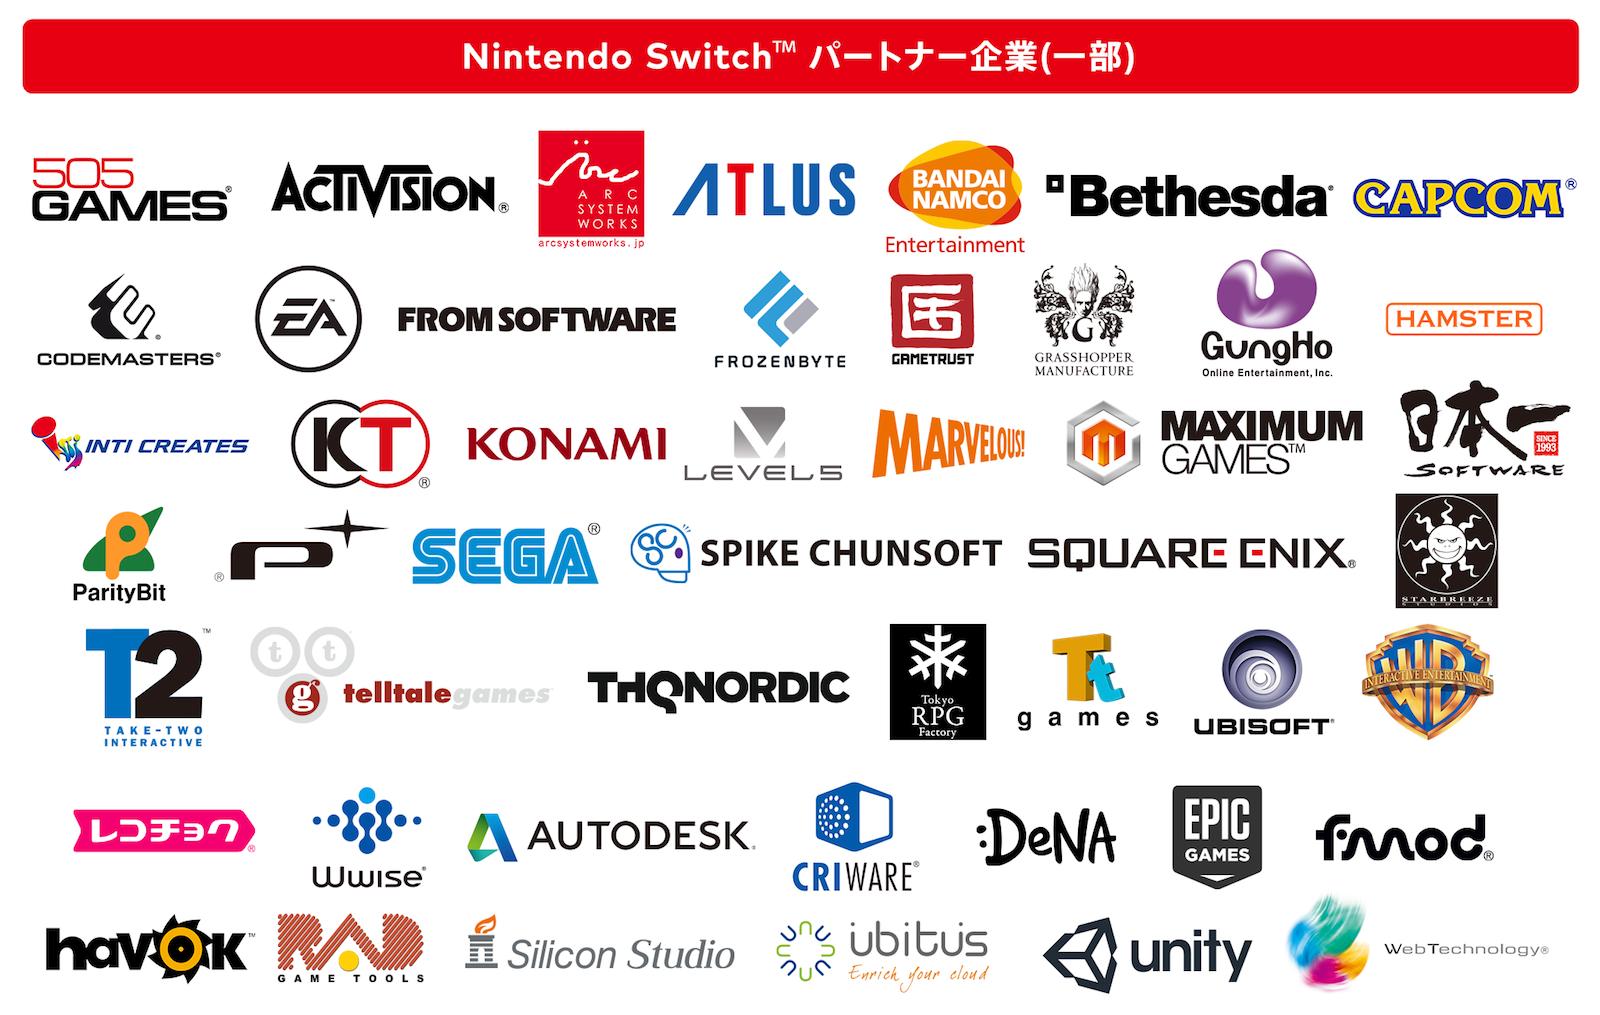 nintendo-switch-image-5.png